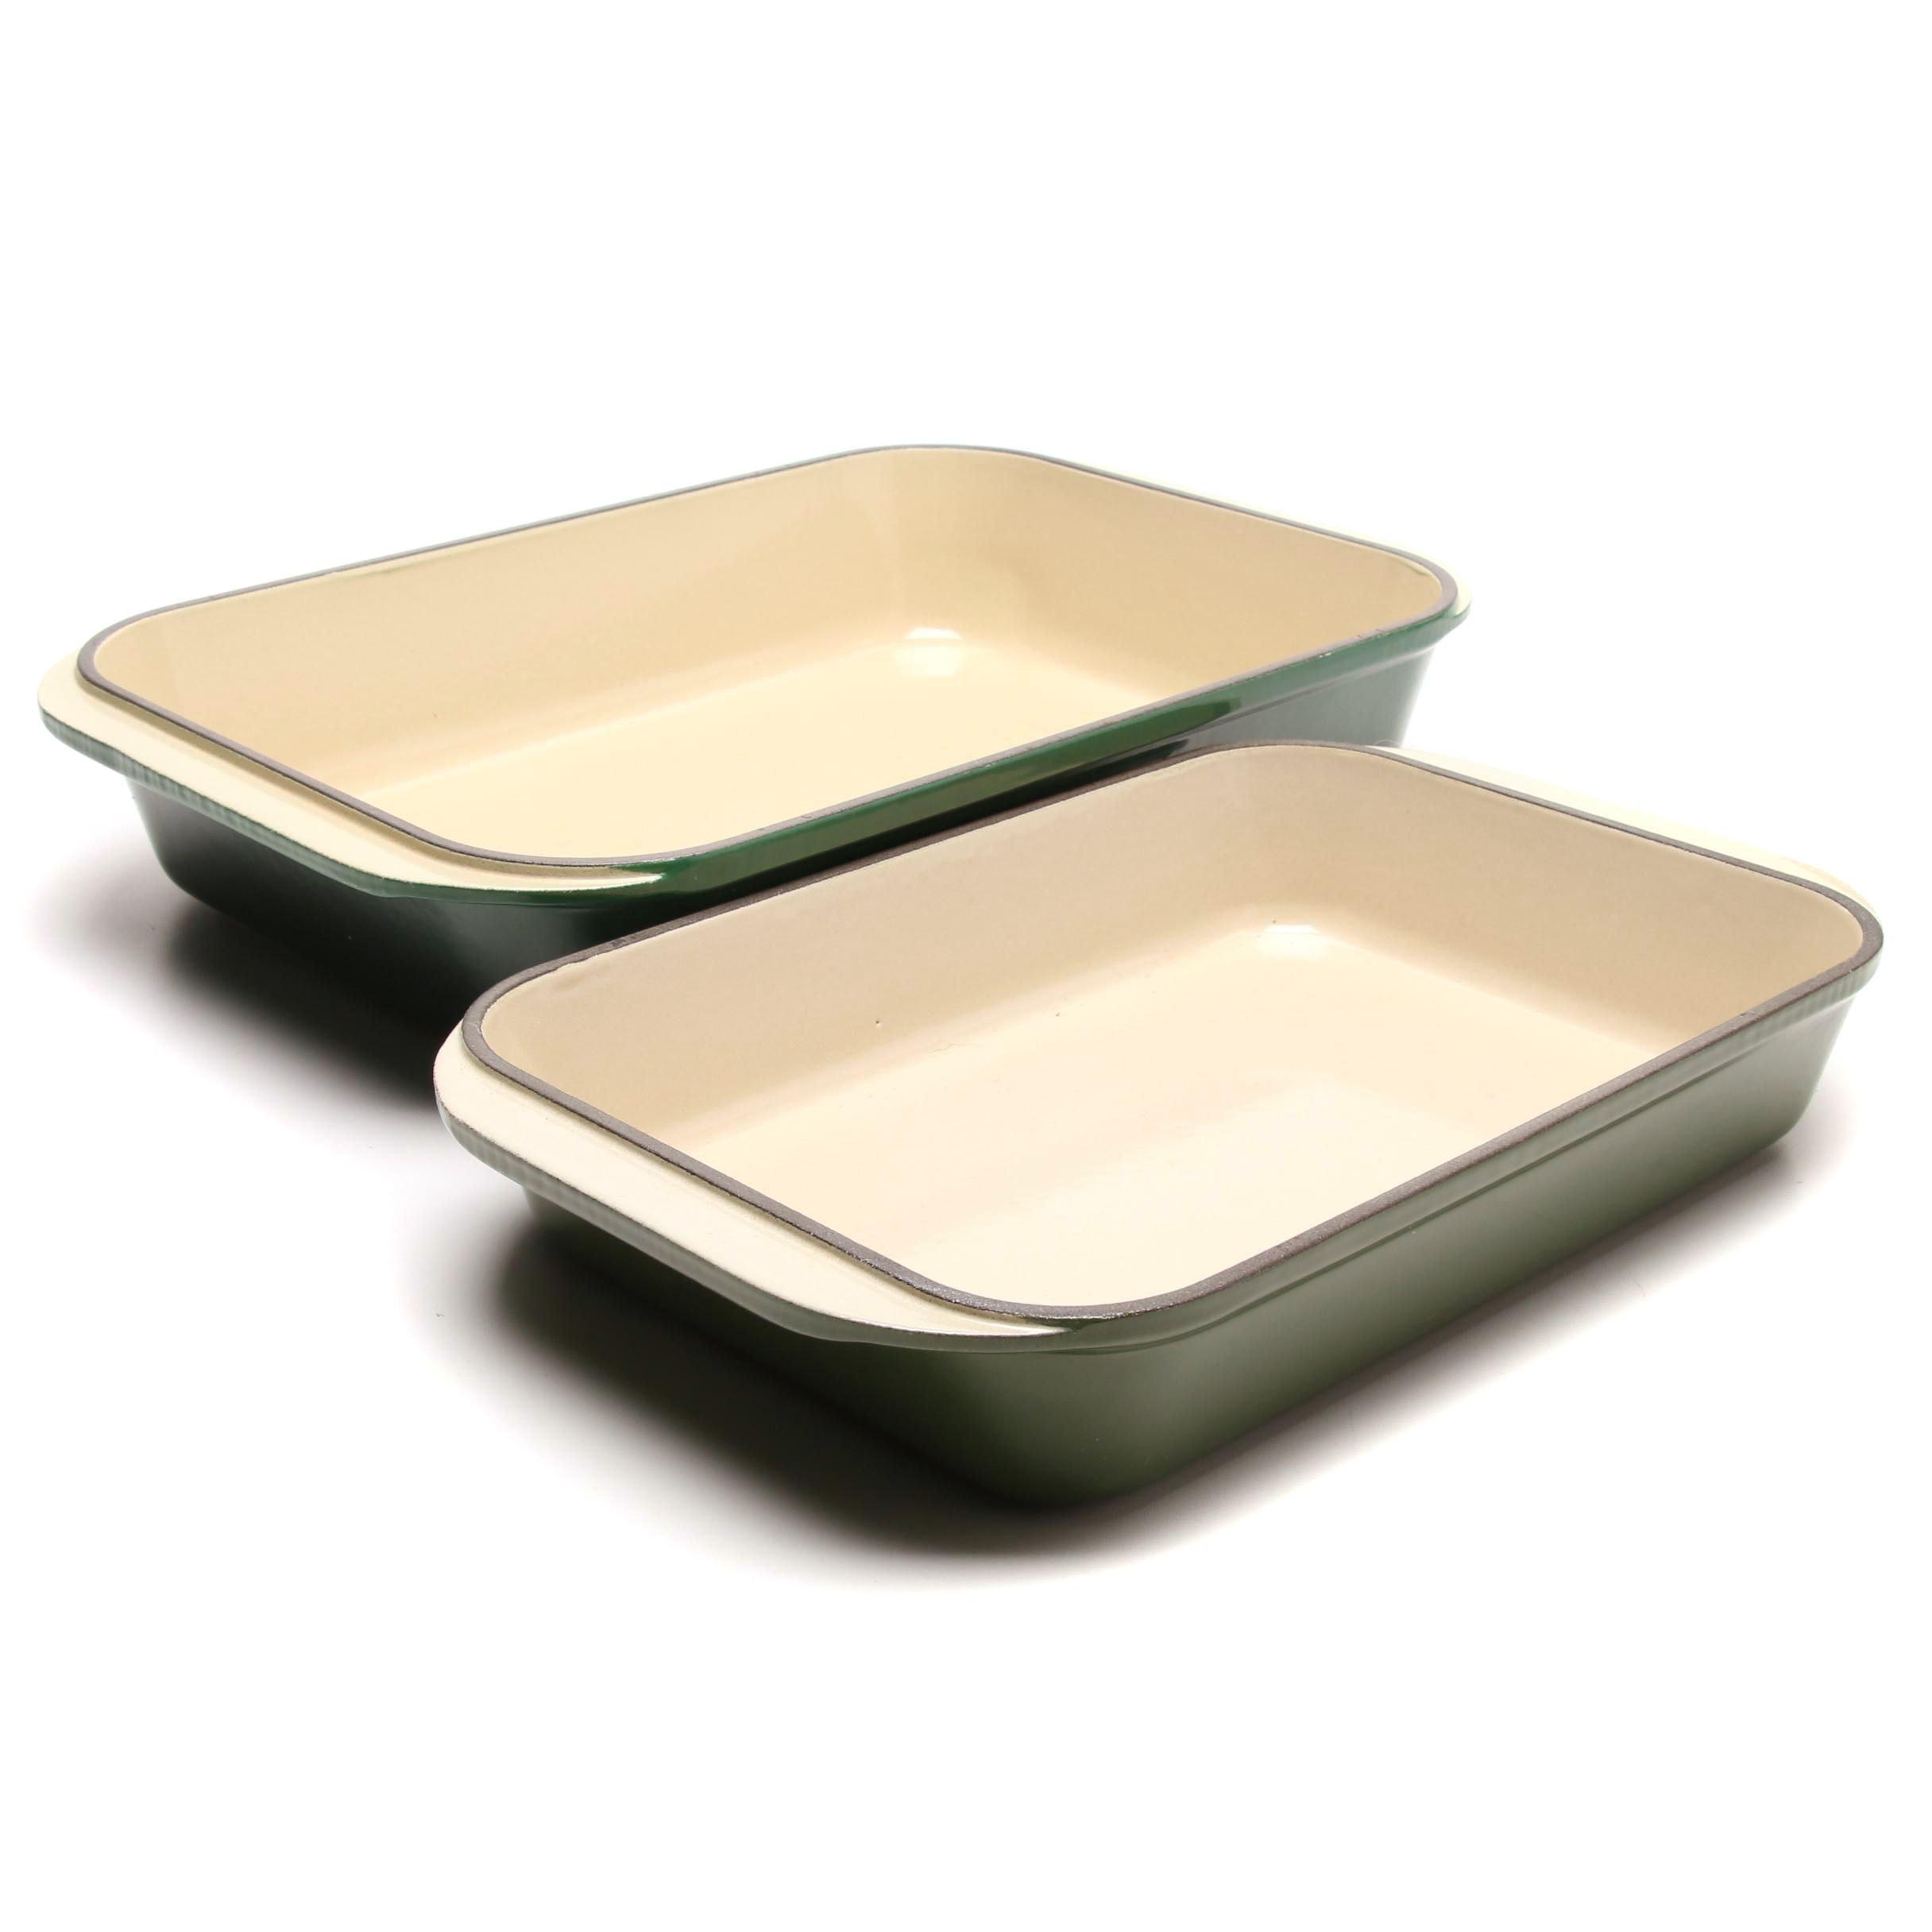 Le Creuset Cast Iron Casserole Bakeware